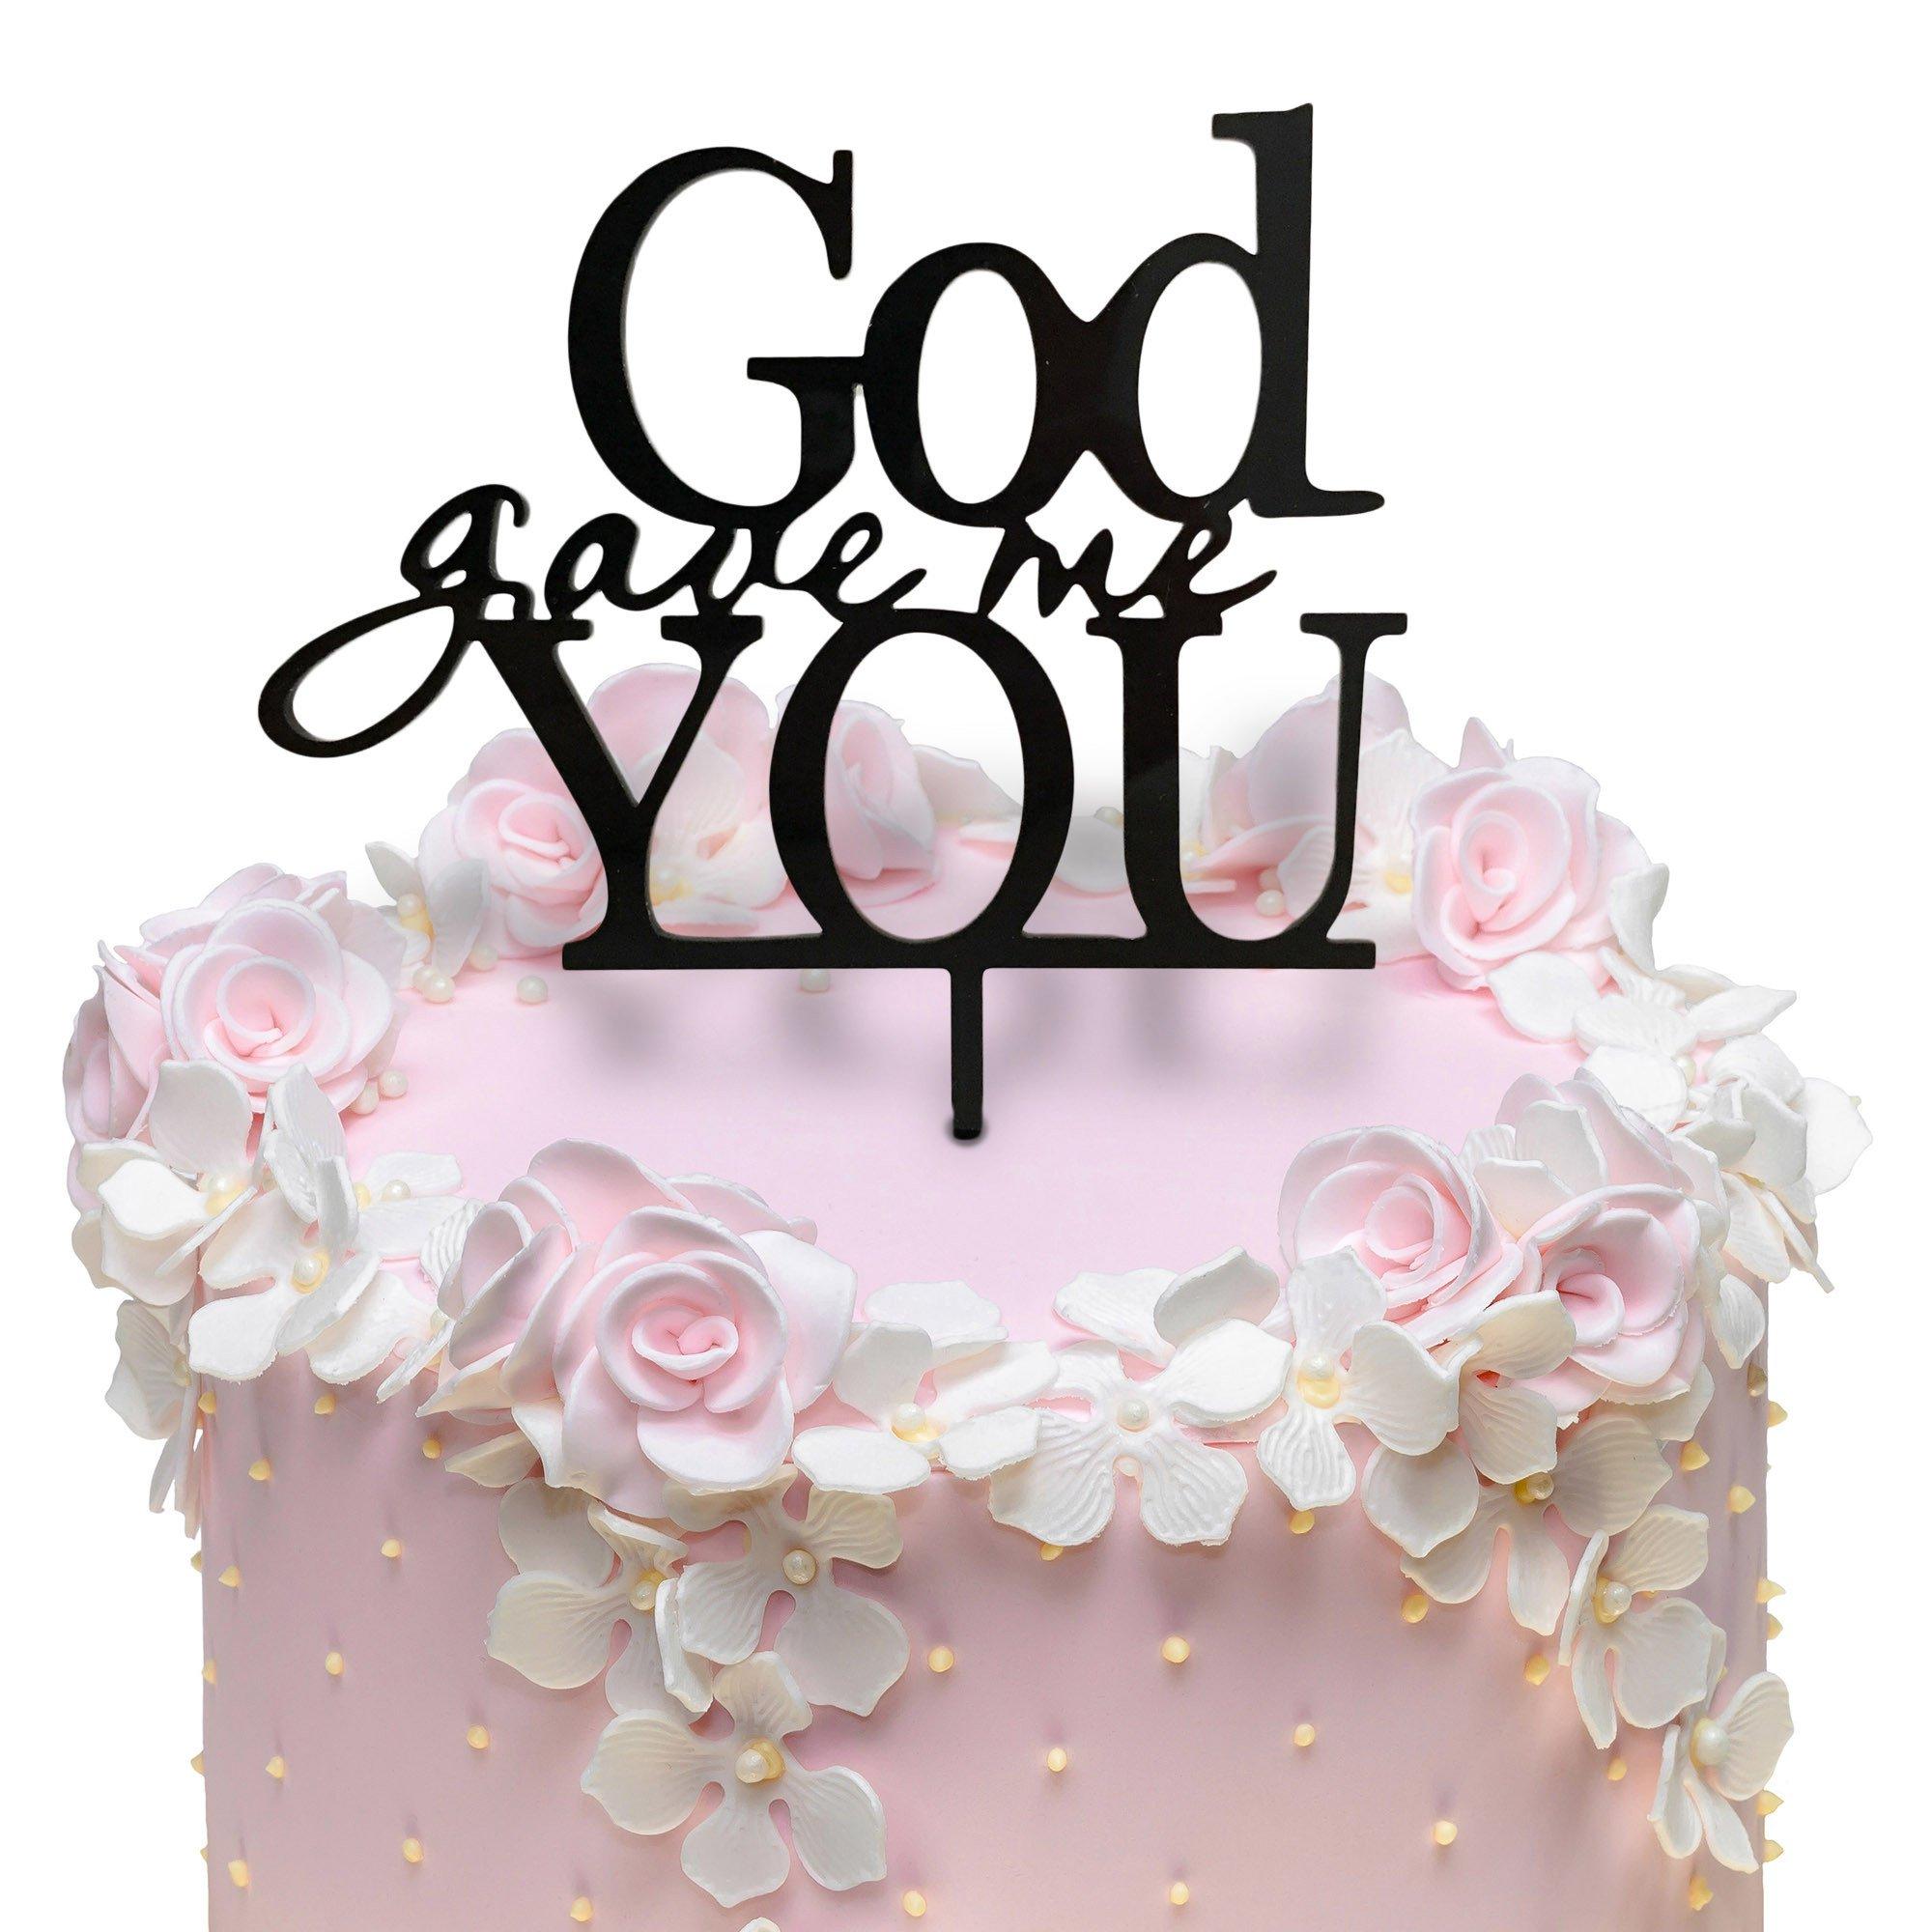 Christian Wedding Reception Ideas: JennyGems Religious Cake Topper